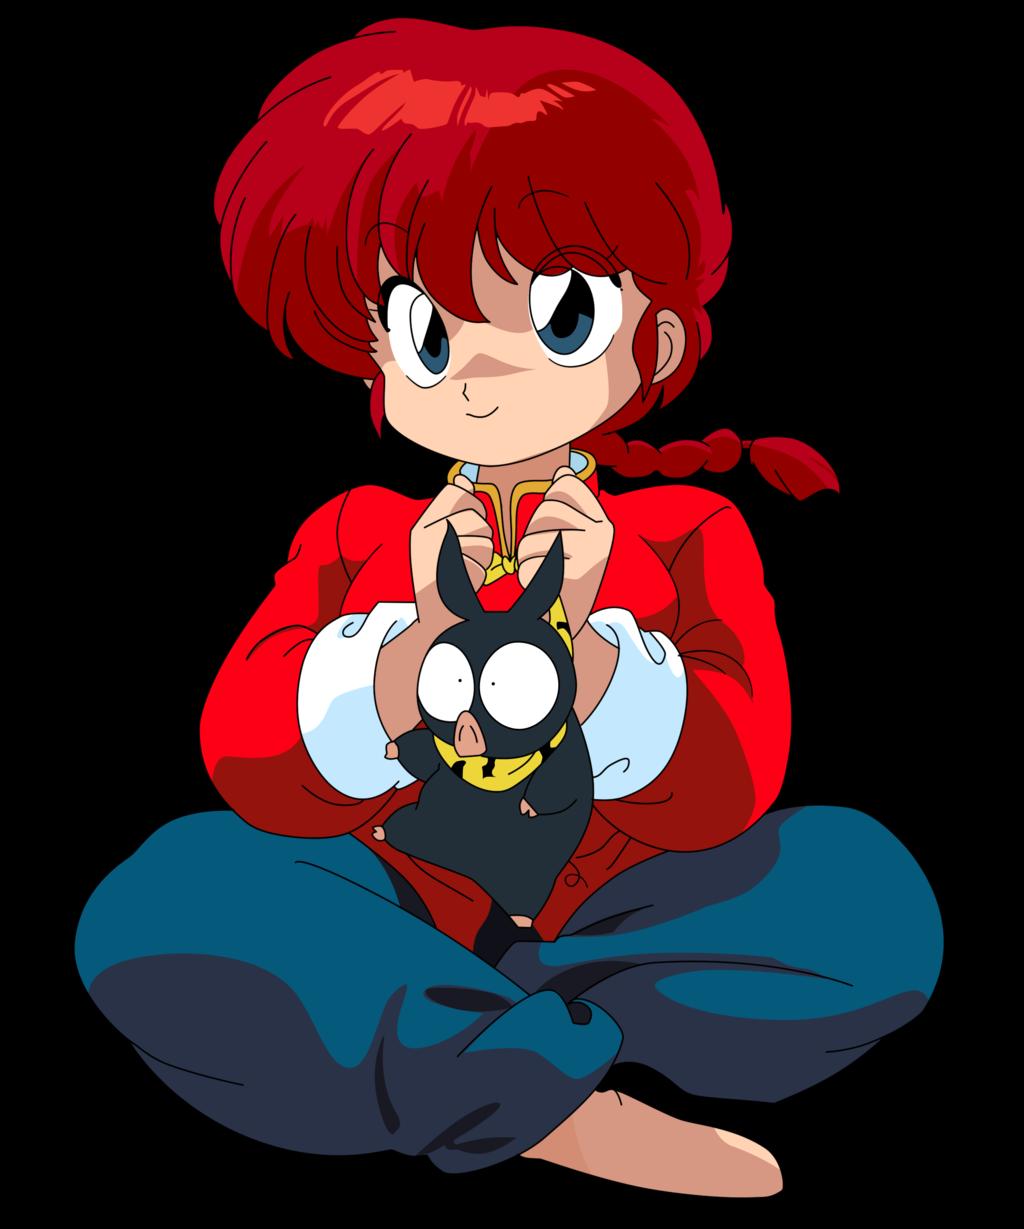 Serie Anime RANMA 1/2 43c277aab54dc0e862bf89dd17e82a97